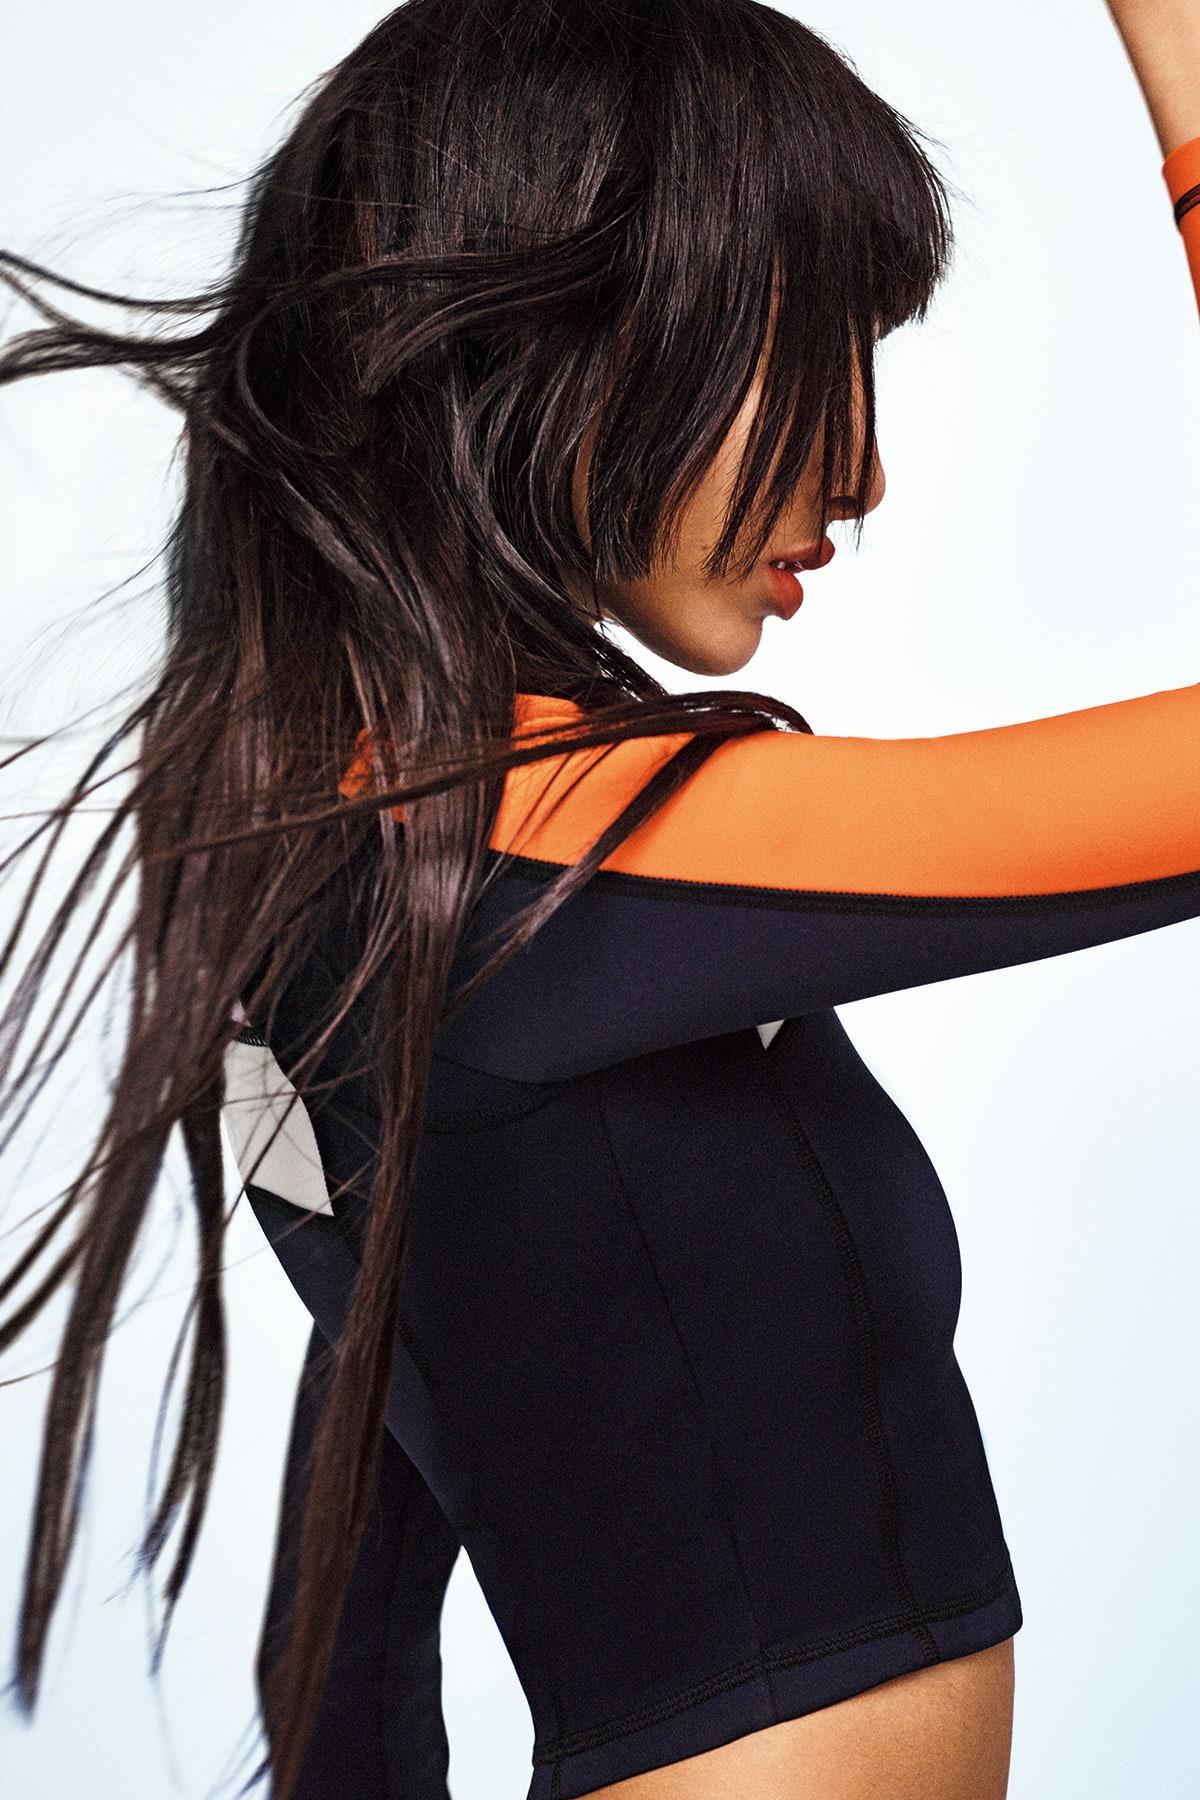 Yasmin Wijnaldum covers Vogue Beauty Japan March 2021 by Yulia Gorbachenko